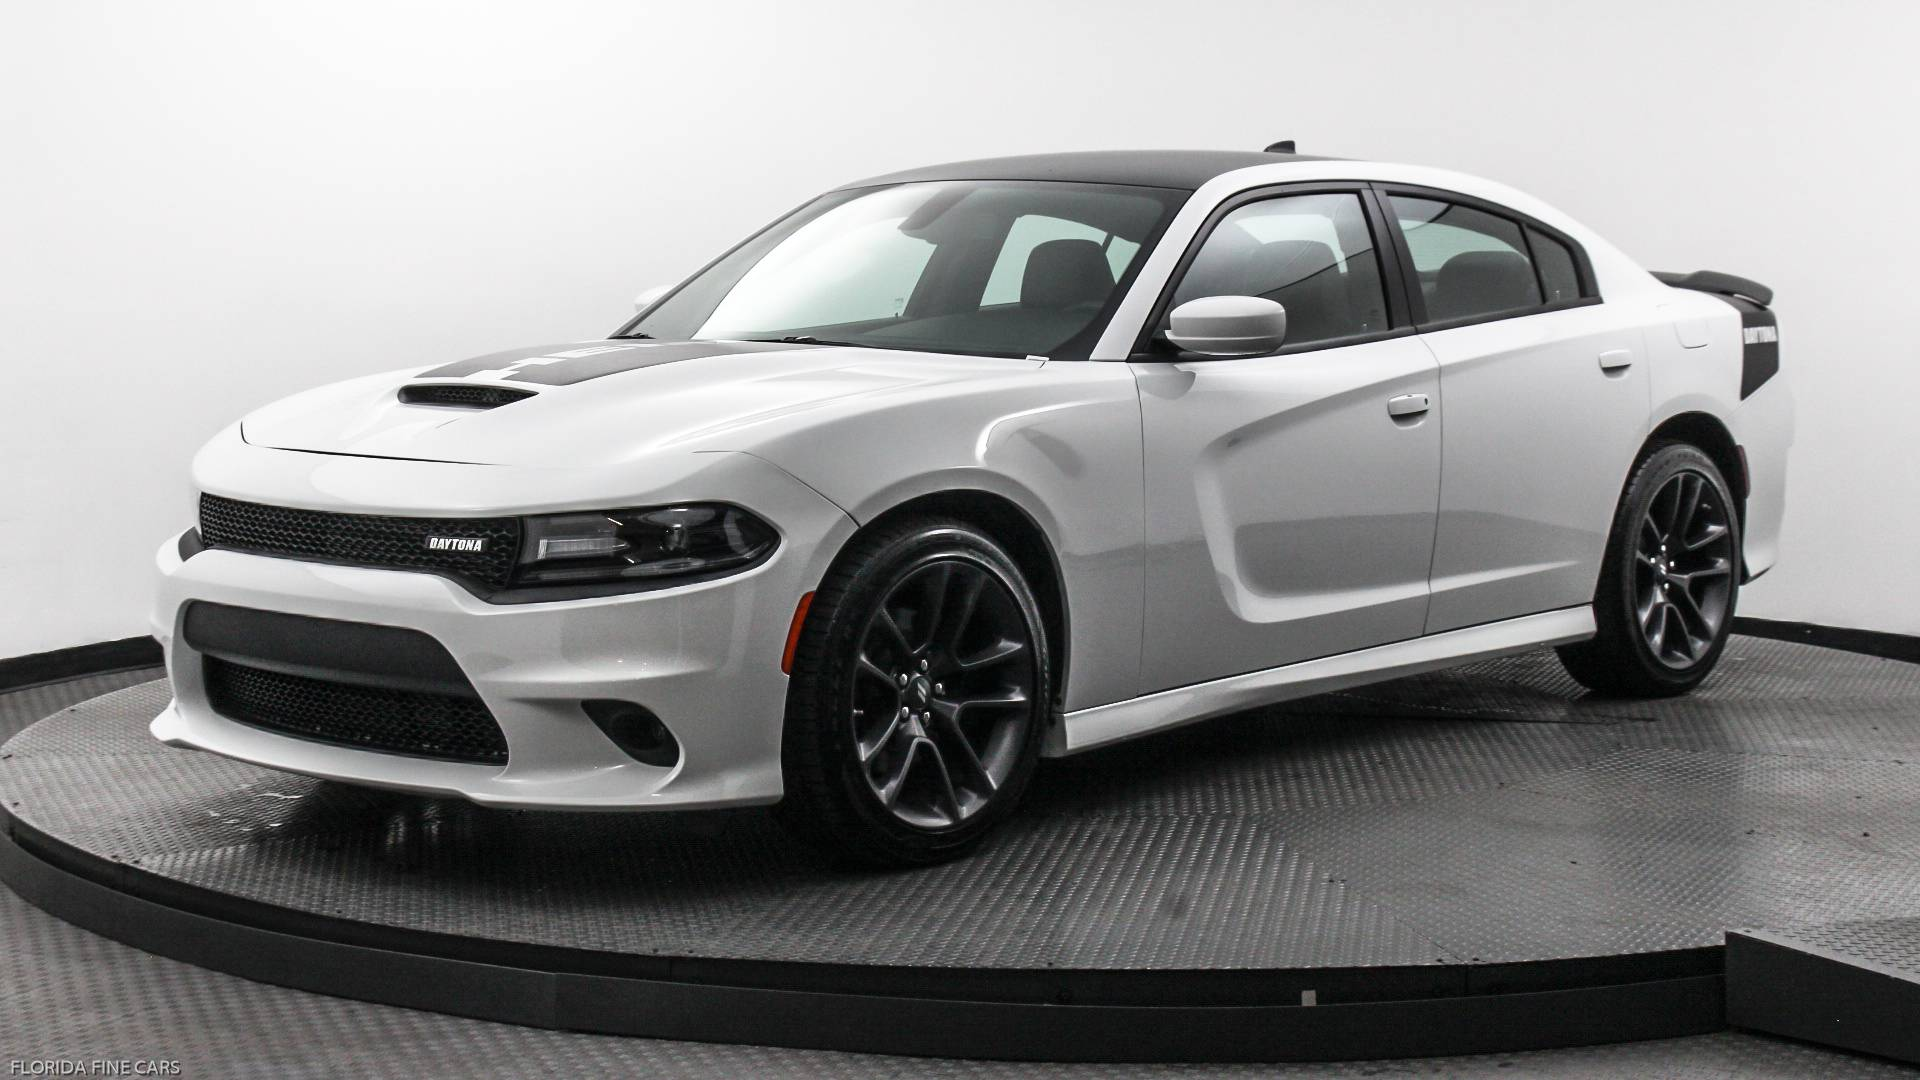 Florida Fine Cars - Used vehicle - Sedan DODGE CHARGER 2020